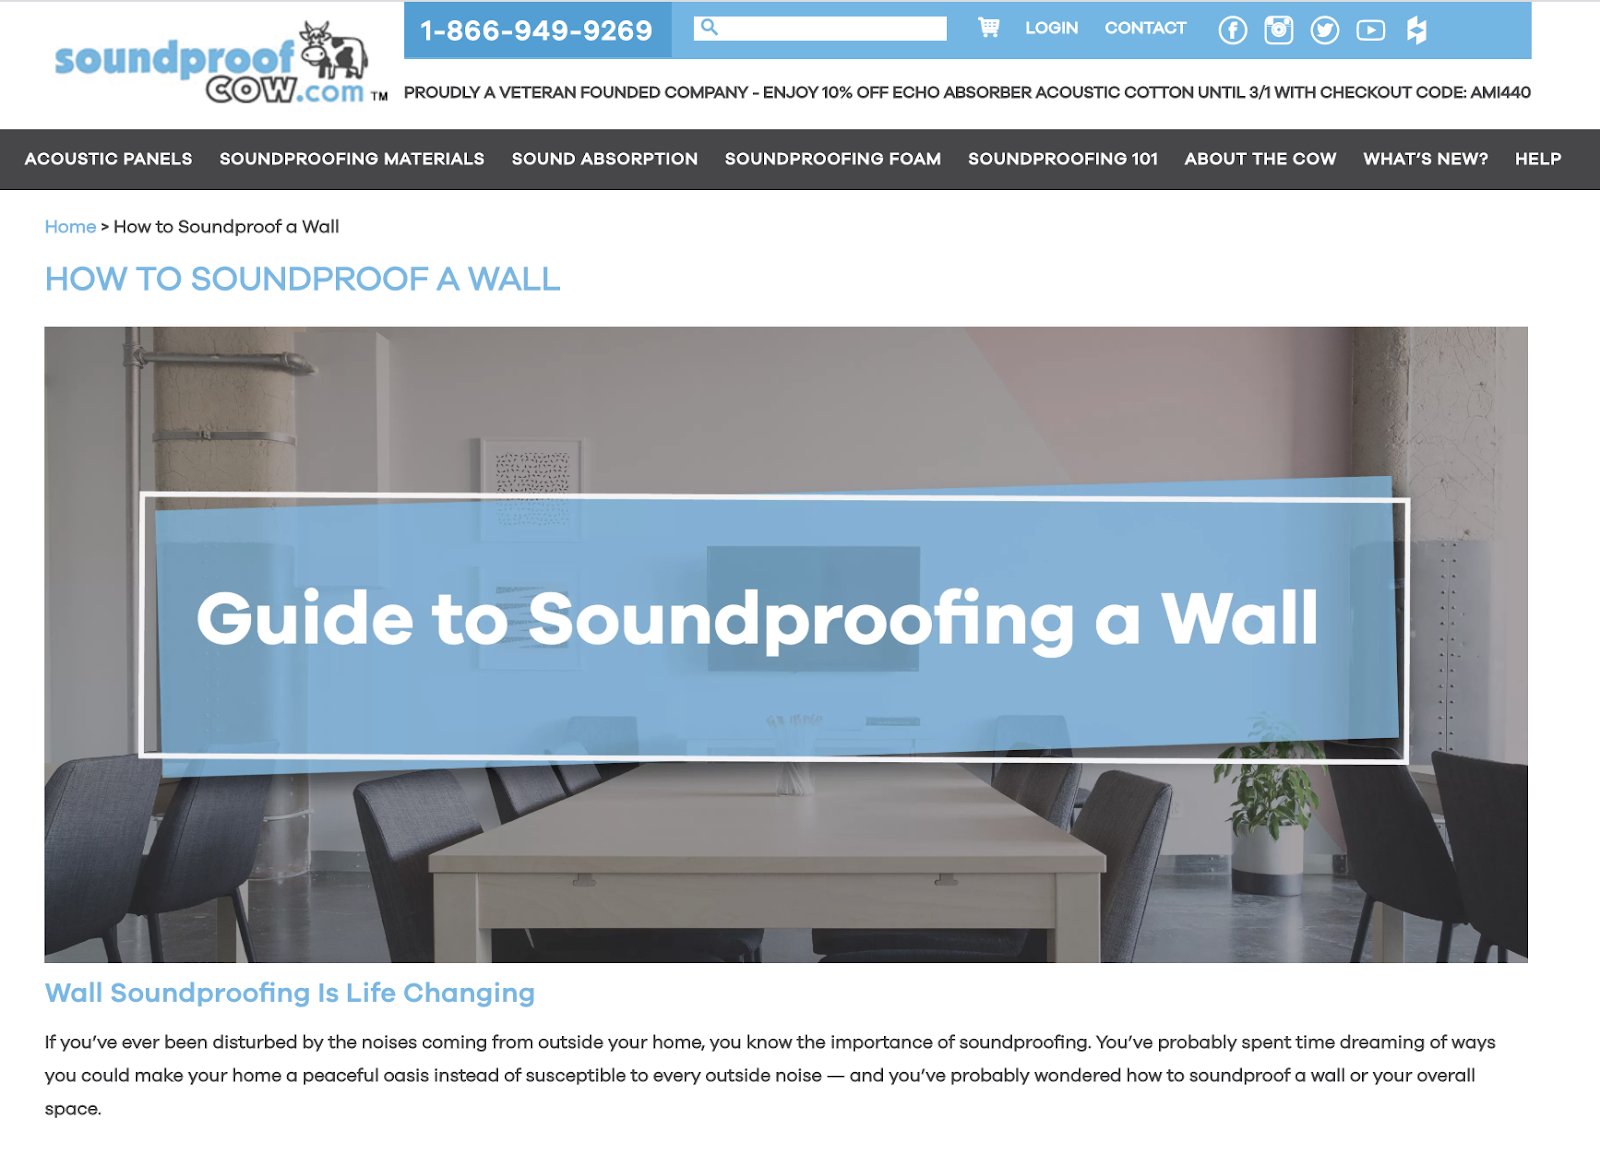 soundproof-cow-pillar-content